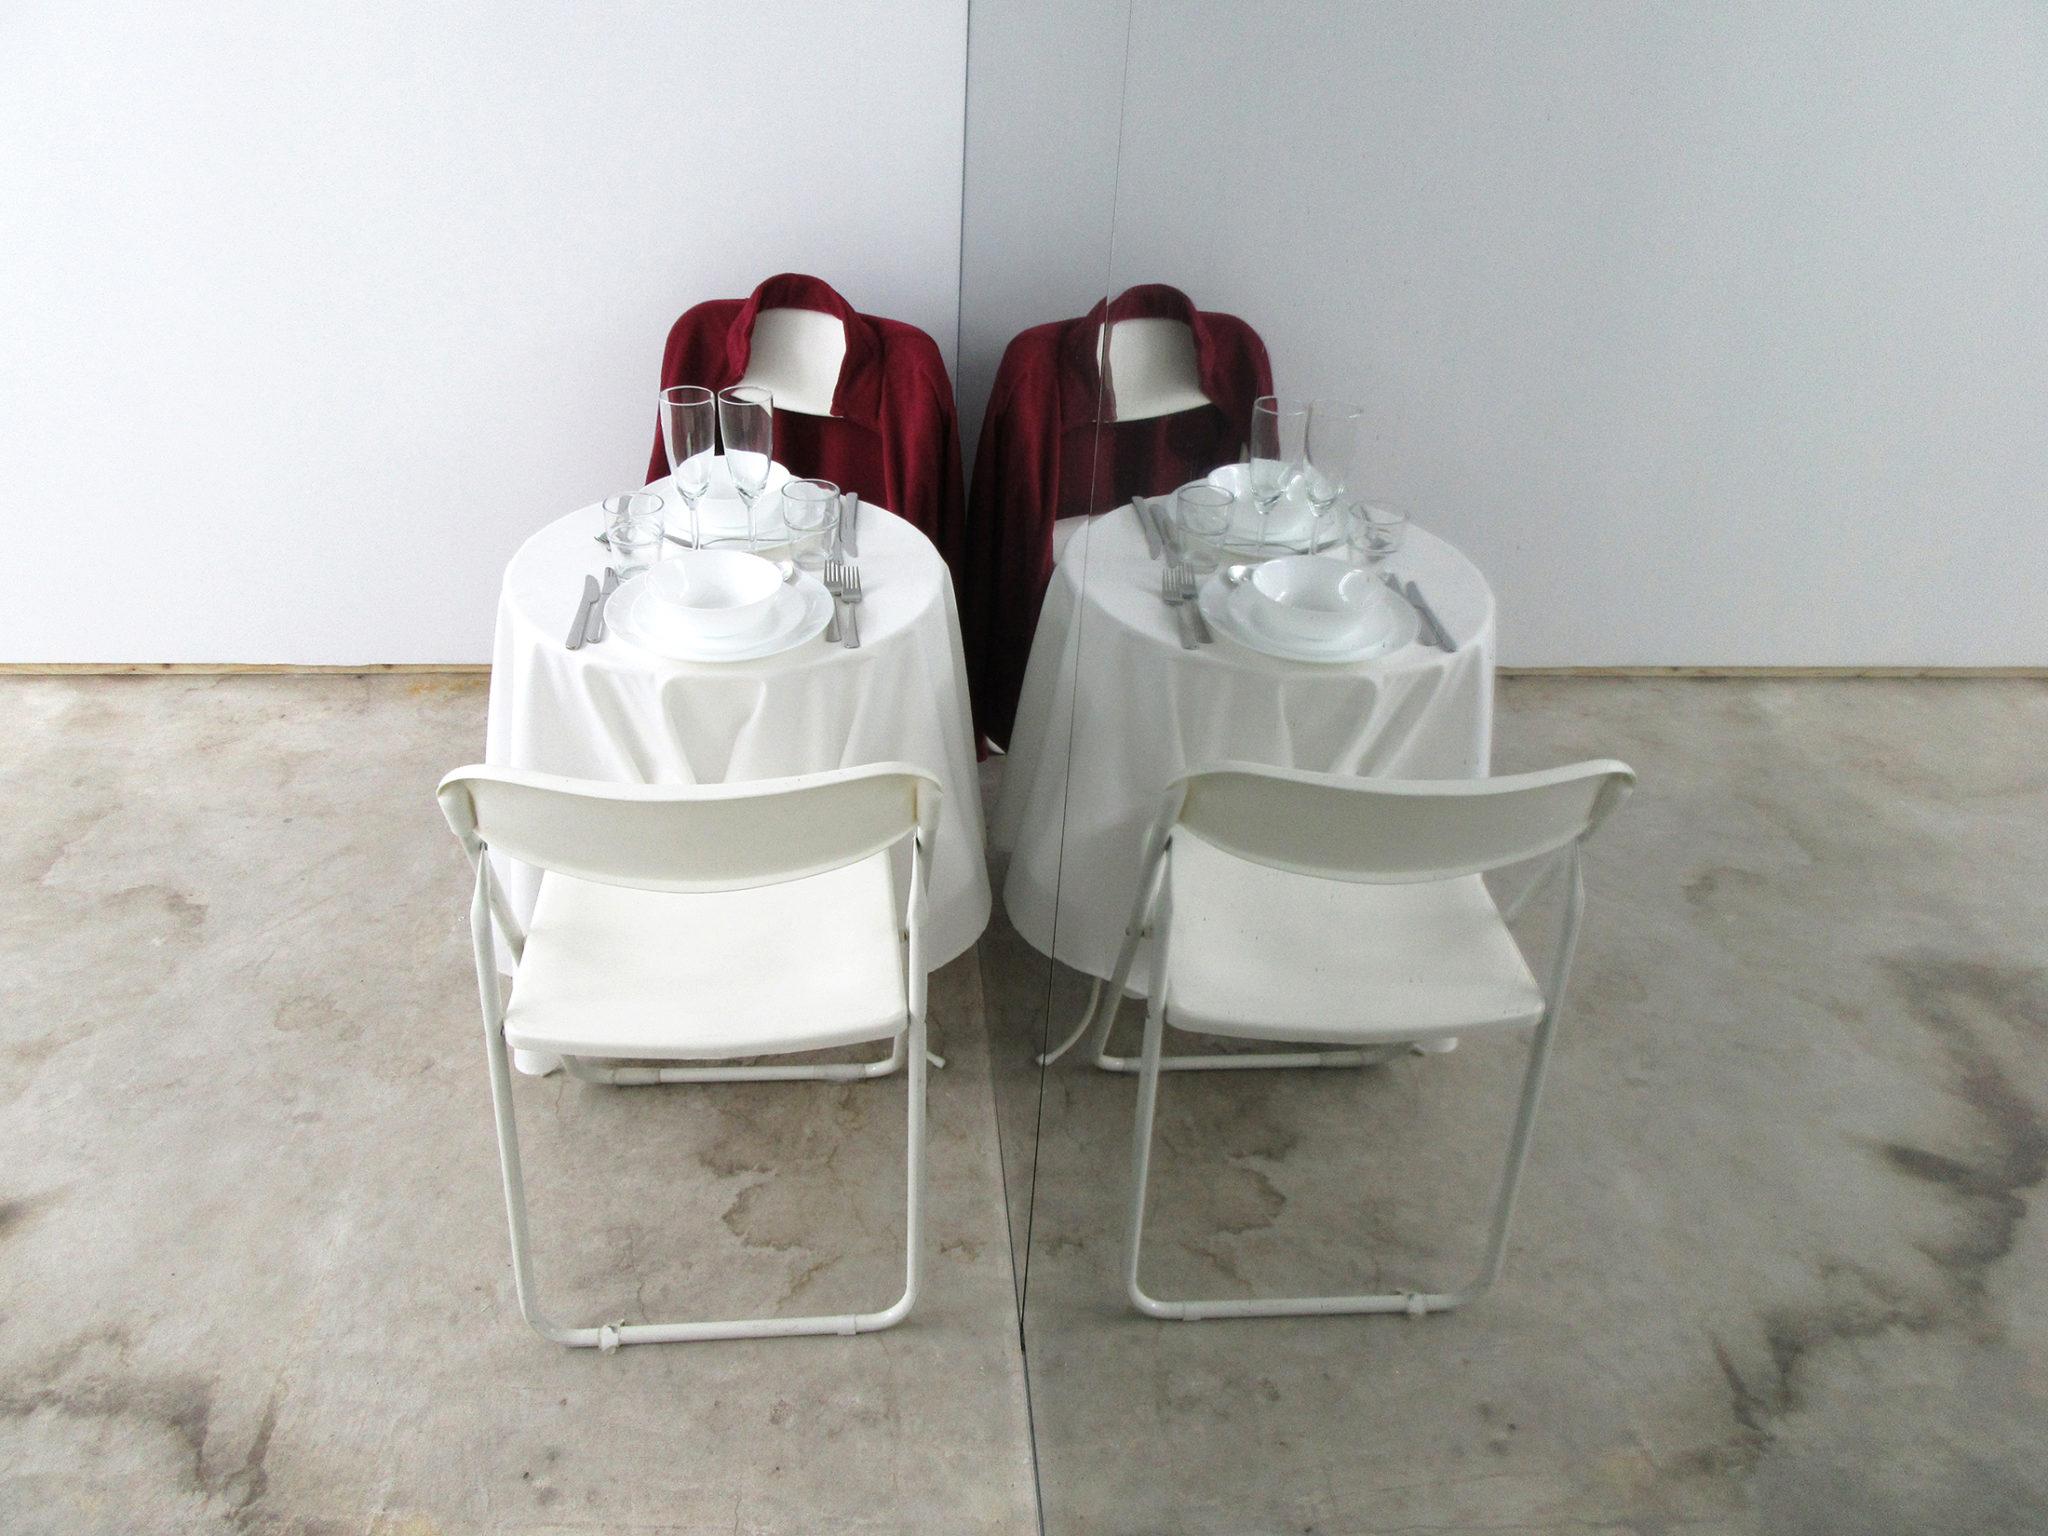 sannahelenaberger-theedgemustbescalloped-diorama-16